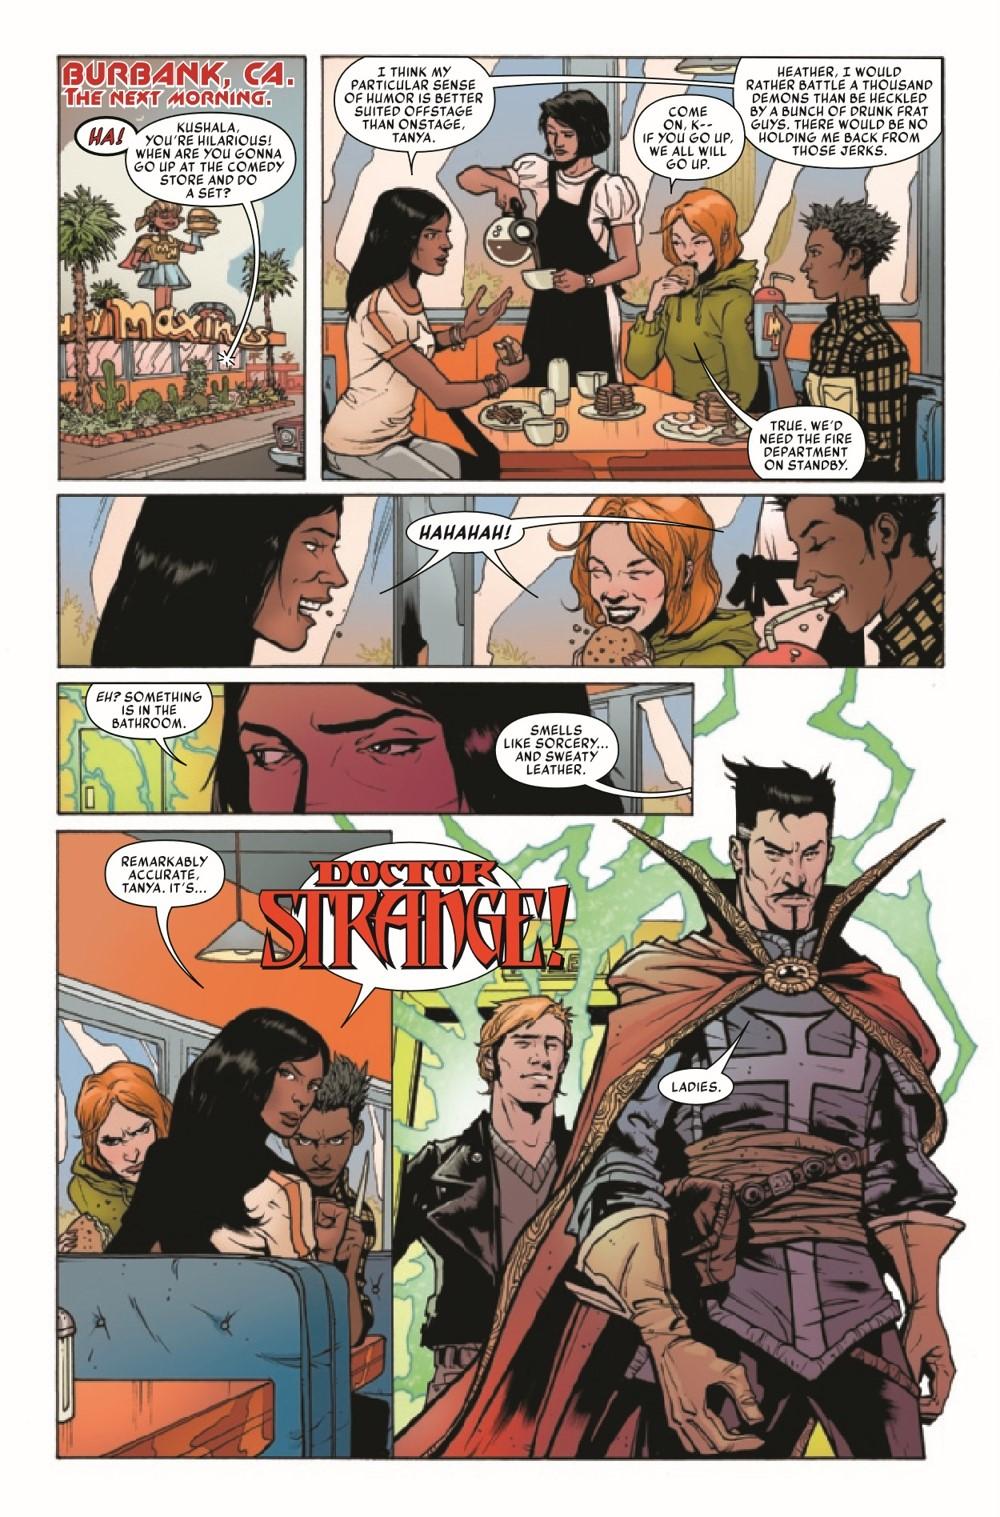 SOVSPRIDER2021001_Preview-3 ComicList Previews: SPIRITS OF VENGEANCE SPIRIT RIDER #1